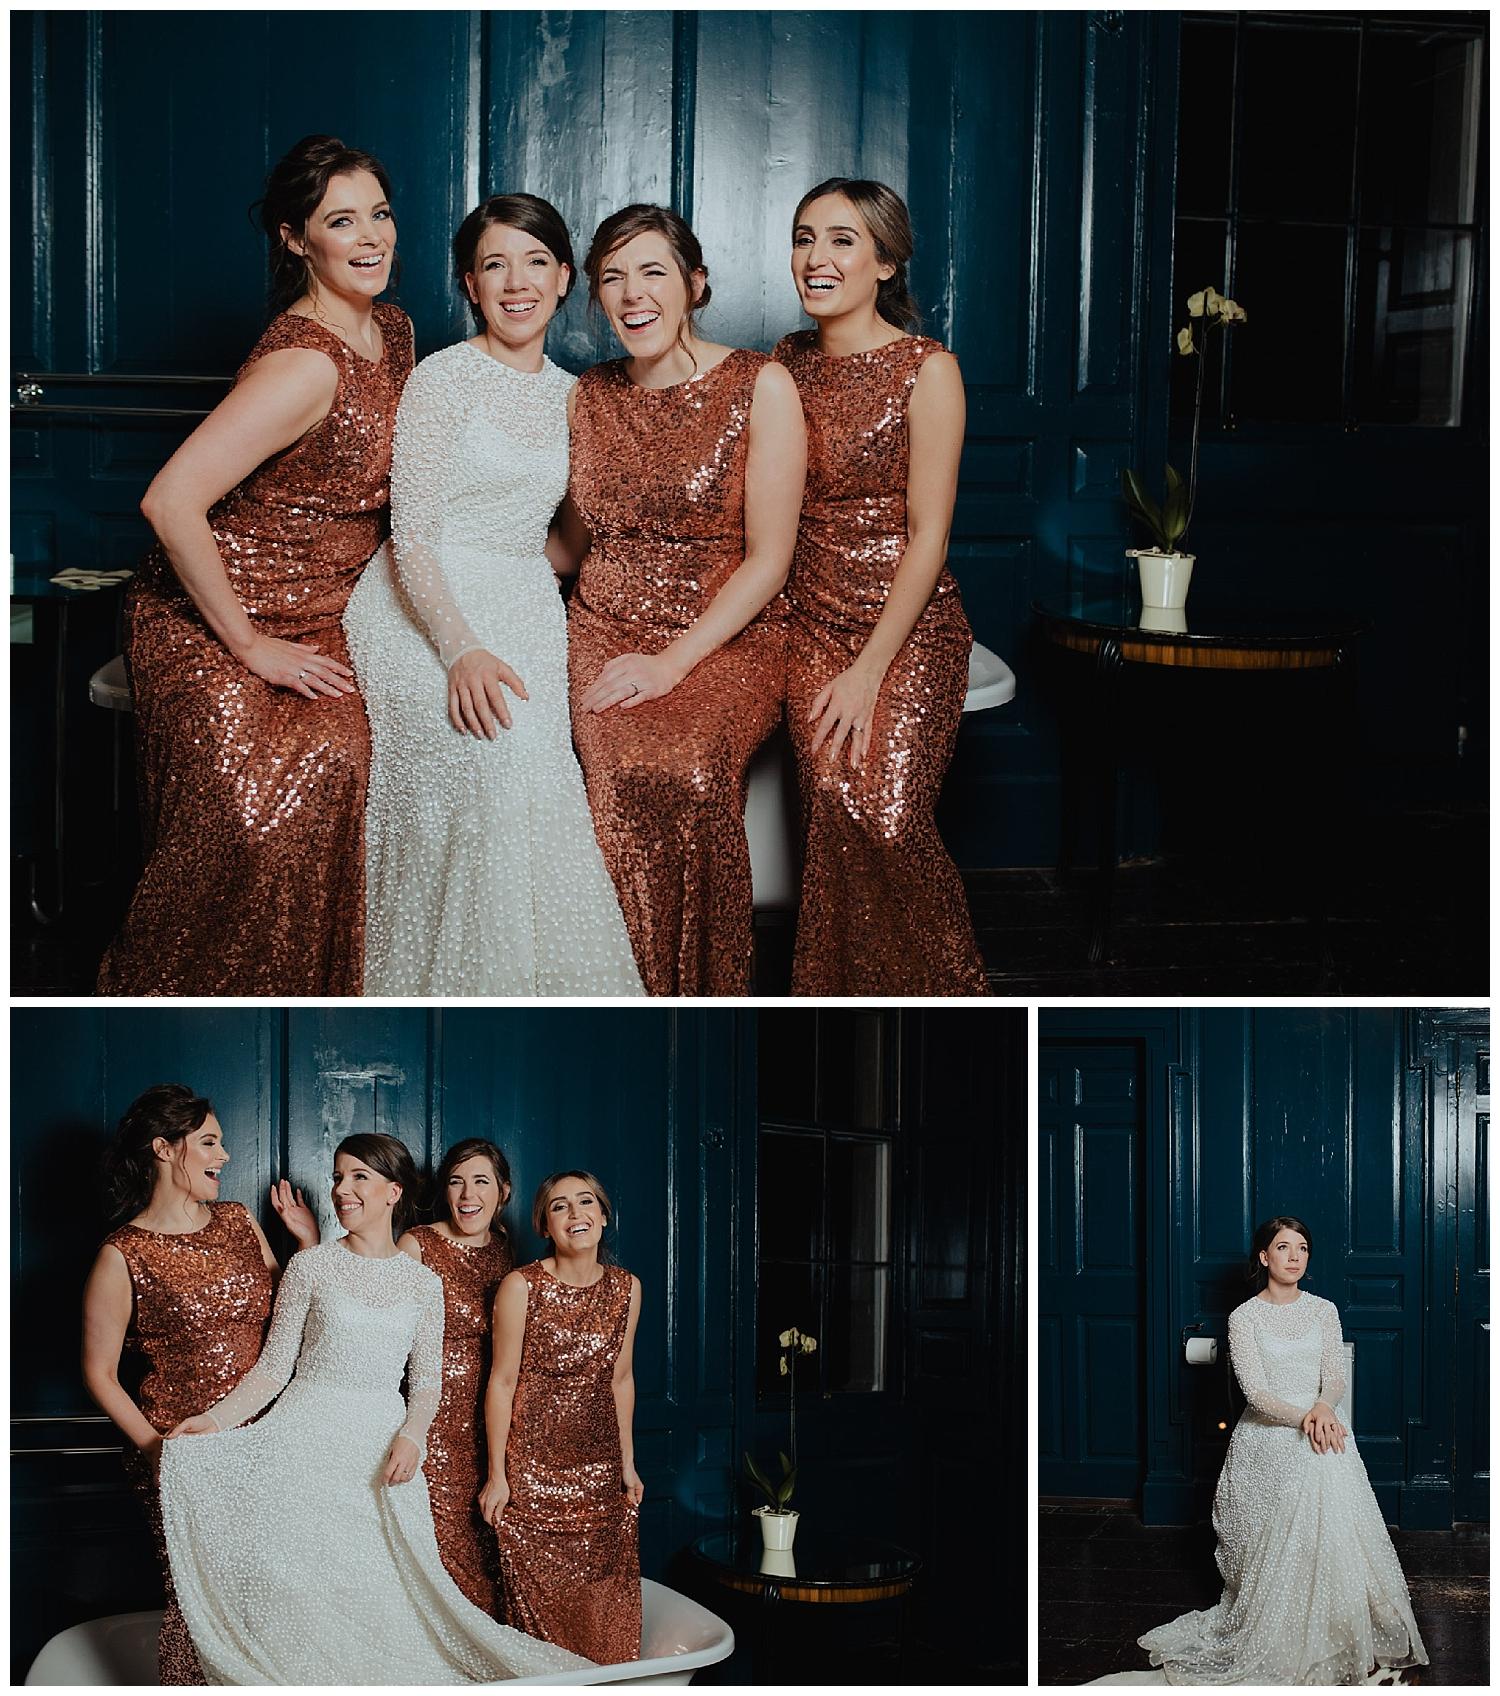 bellinter_house_wedding_livia_figueiredo_131.jpg